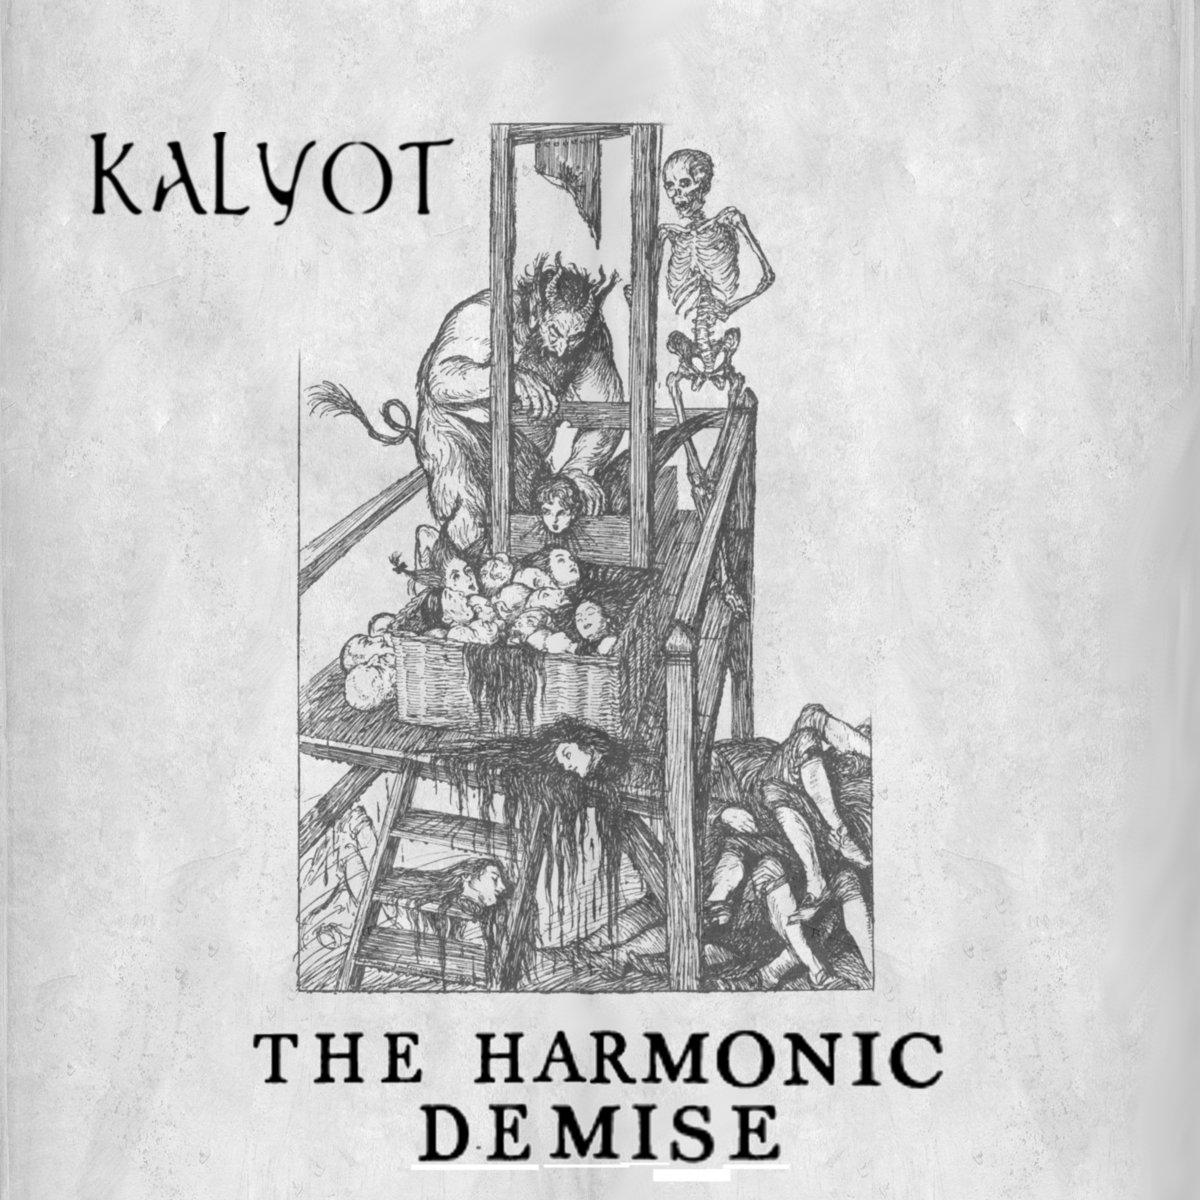 Kalyot - Murderous theater